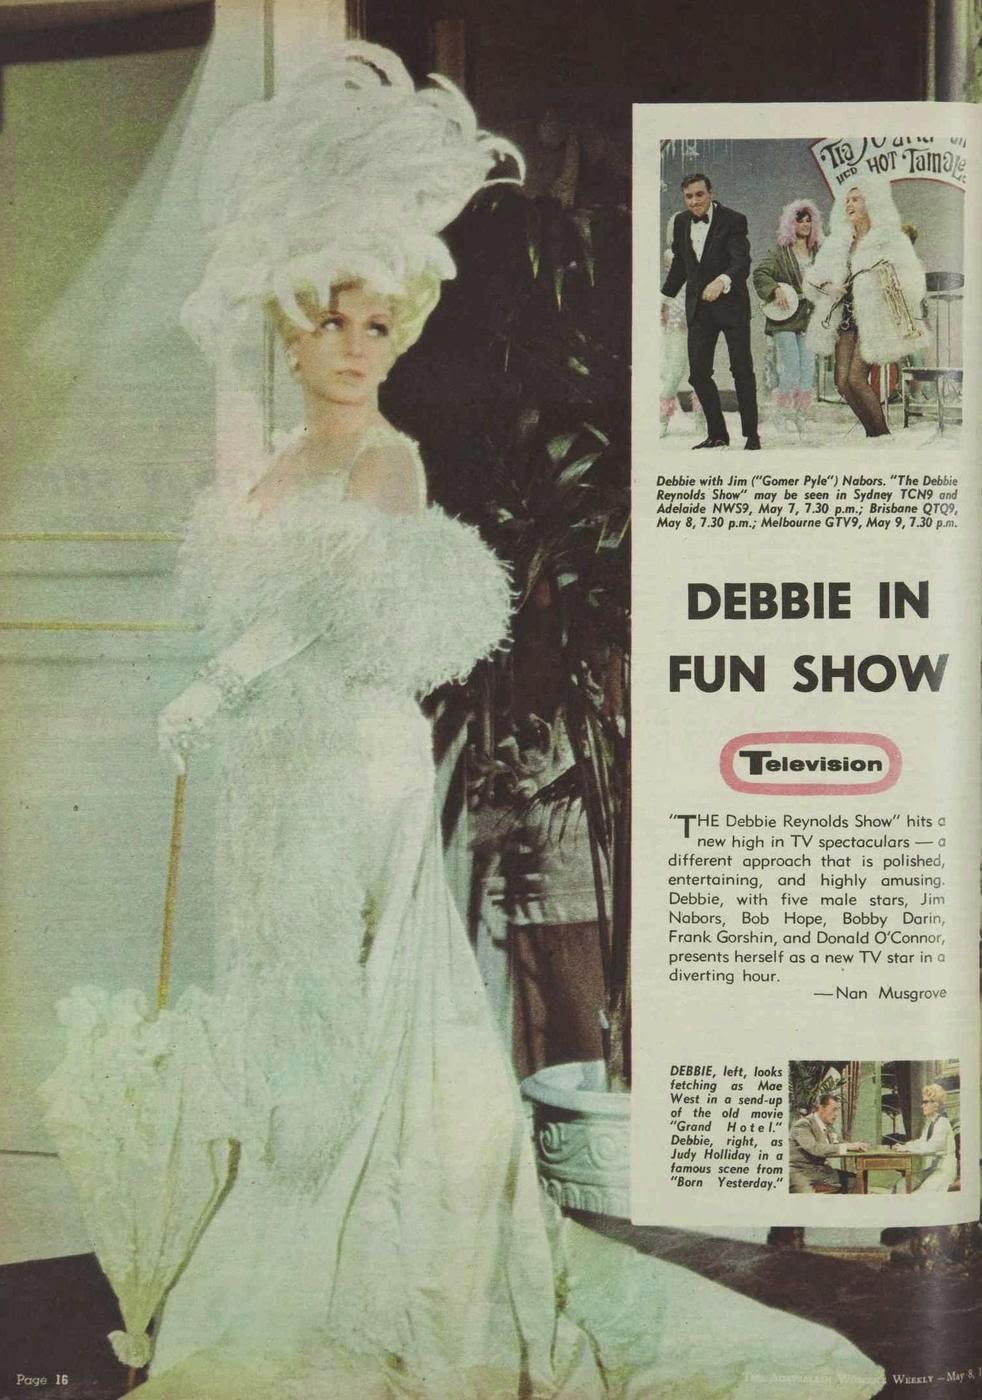 the Debbie Reynolds show, 1968